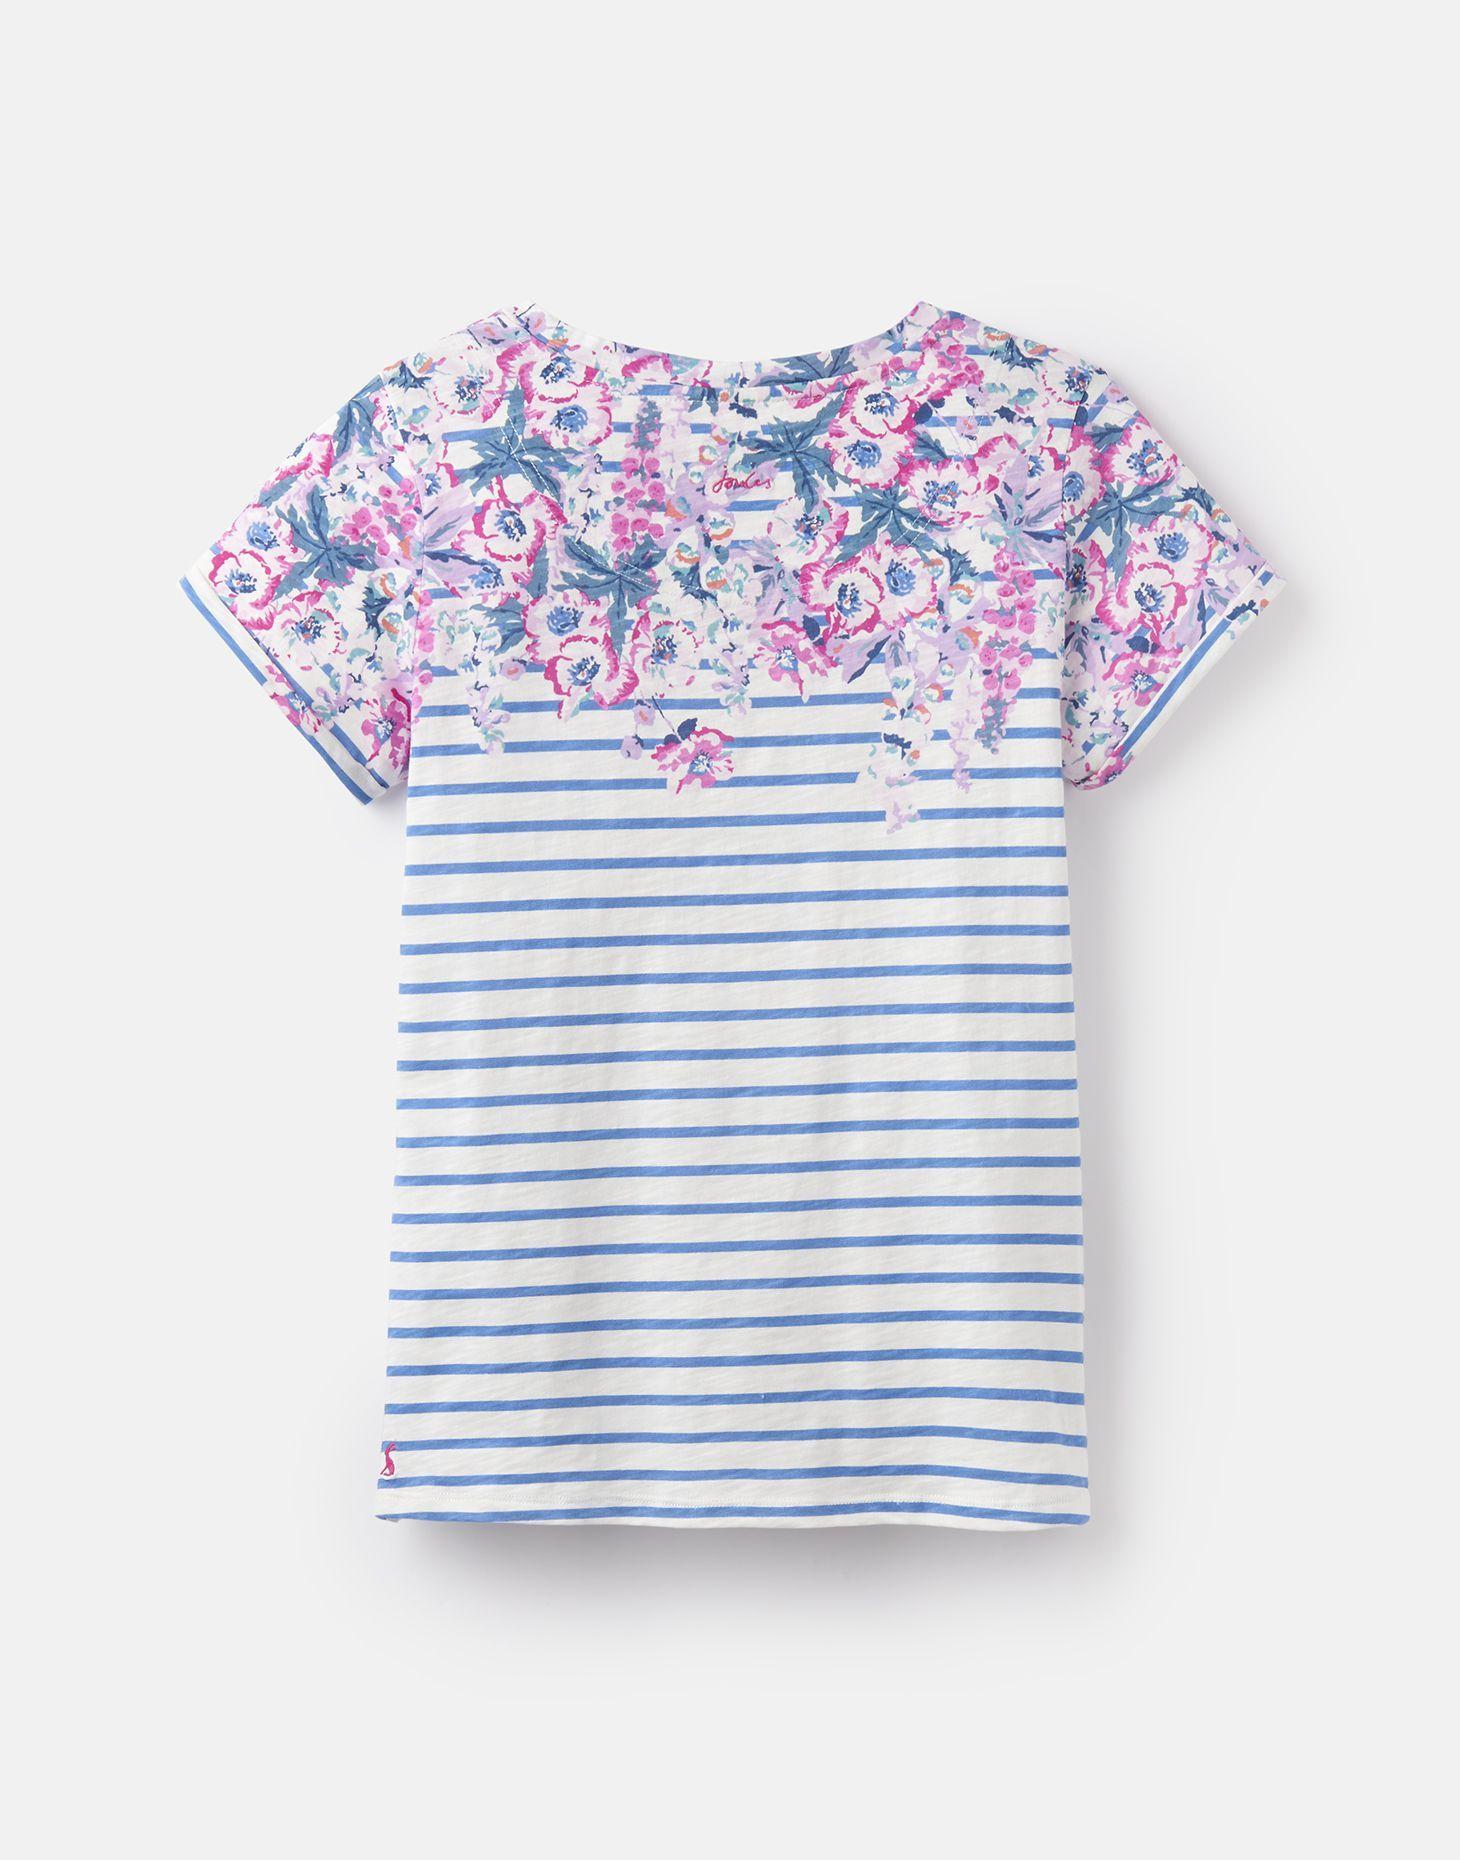 f90f48feb1a4f9 Nessa print BLUE STRIPE FLORAL BORDER Lightweight Jersey T-Shirt | Joules UK